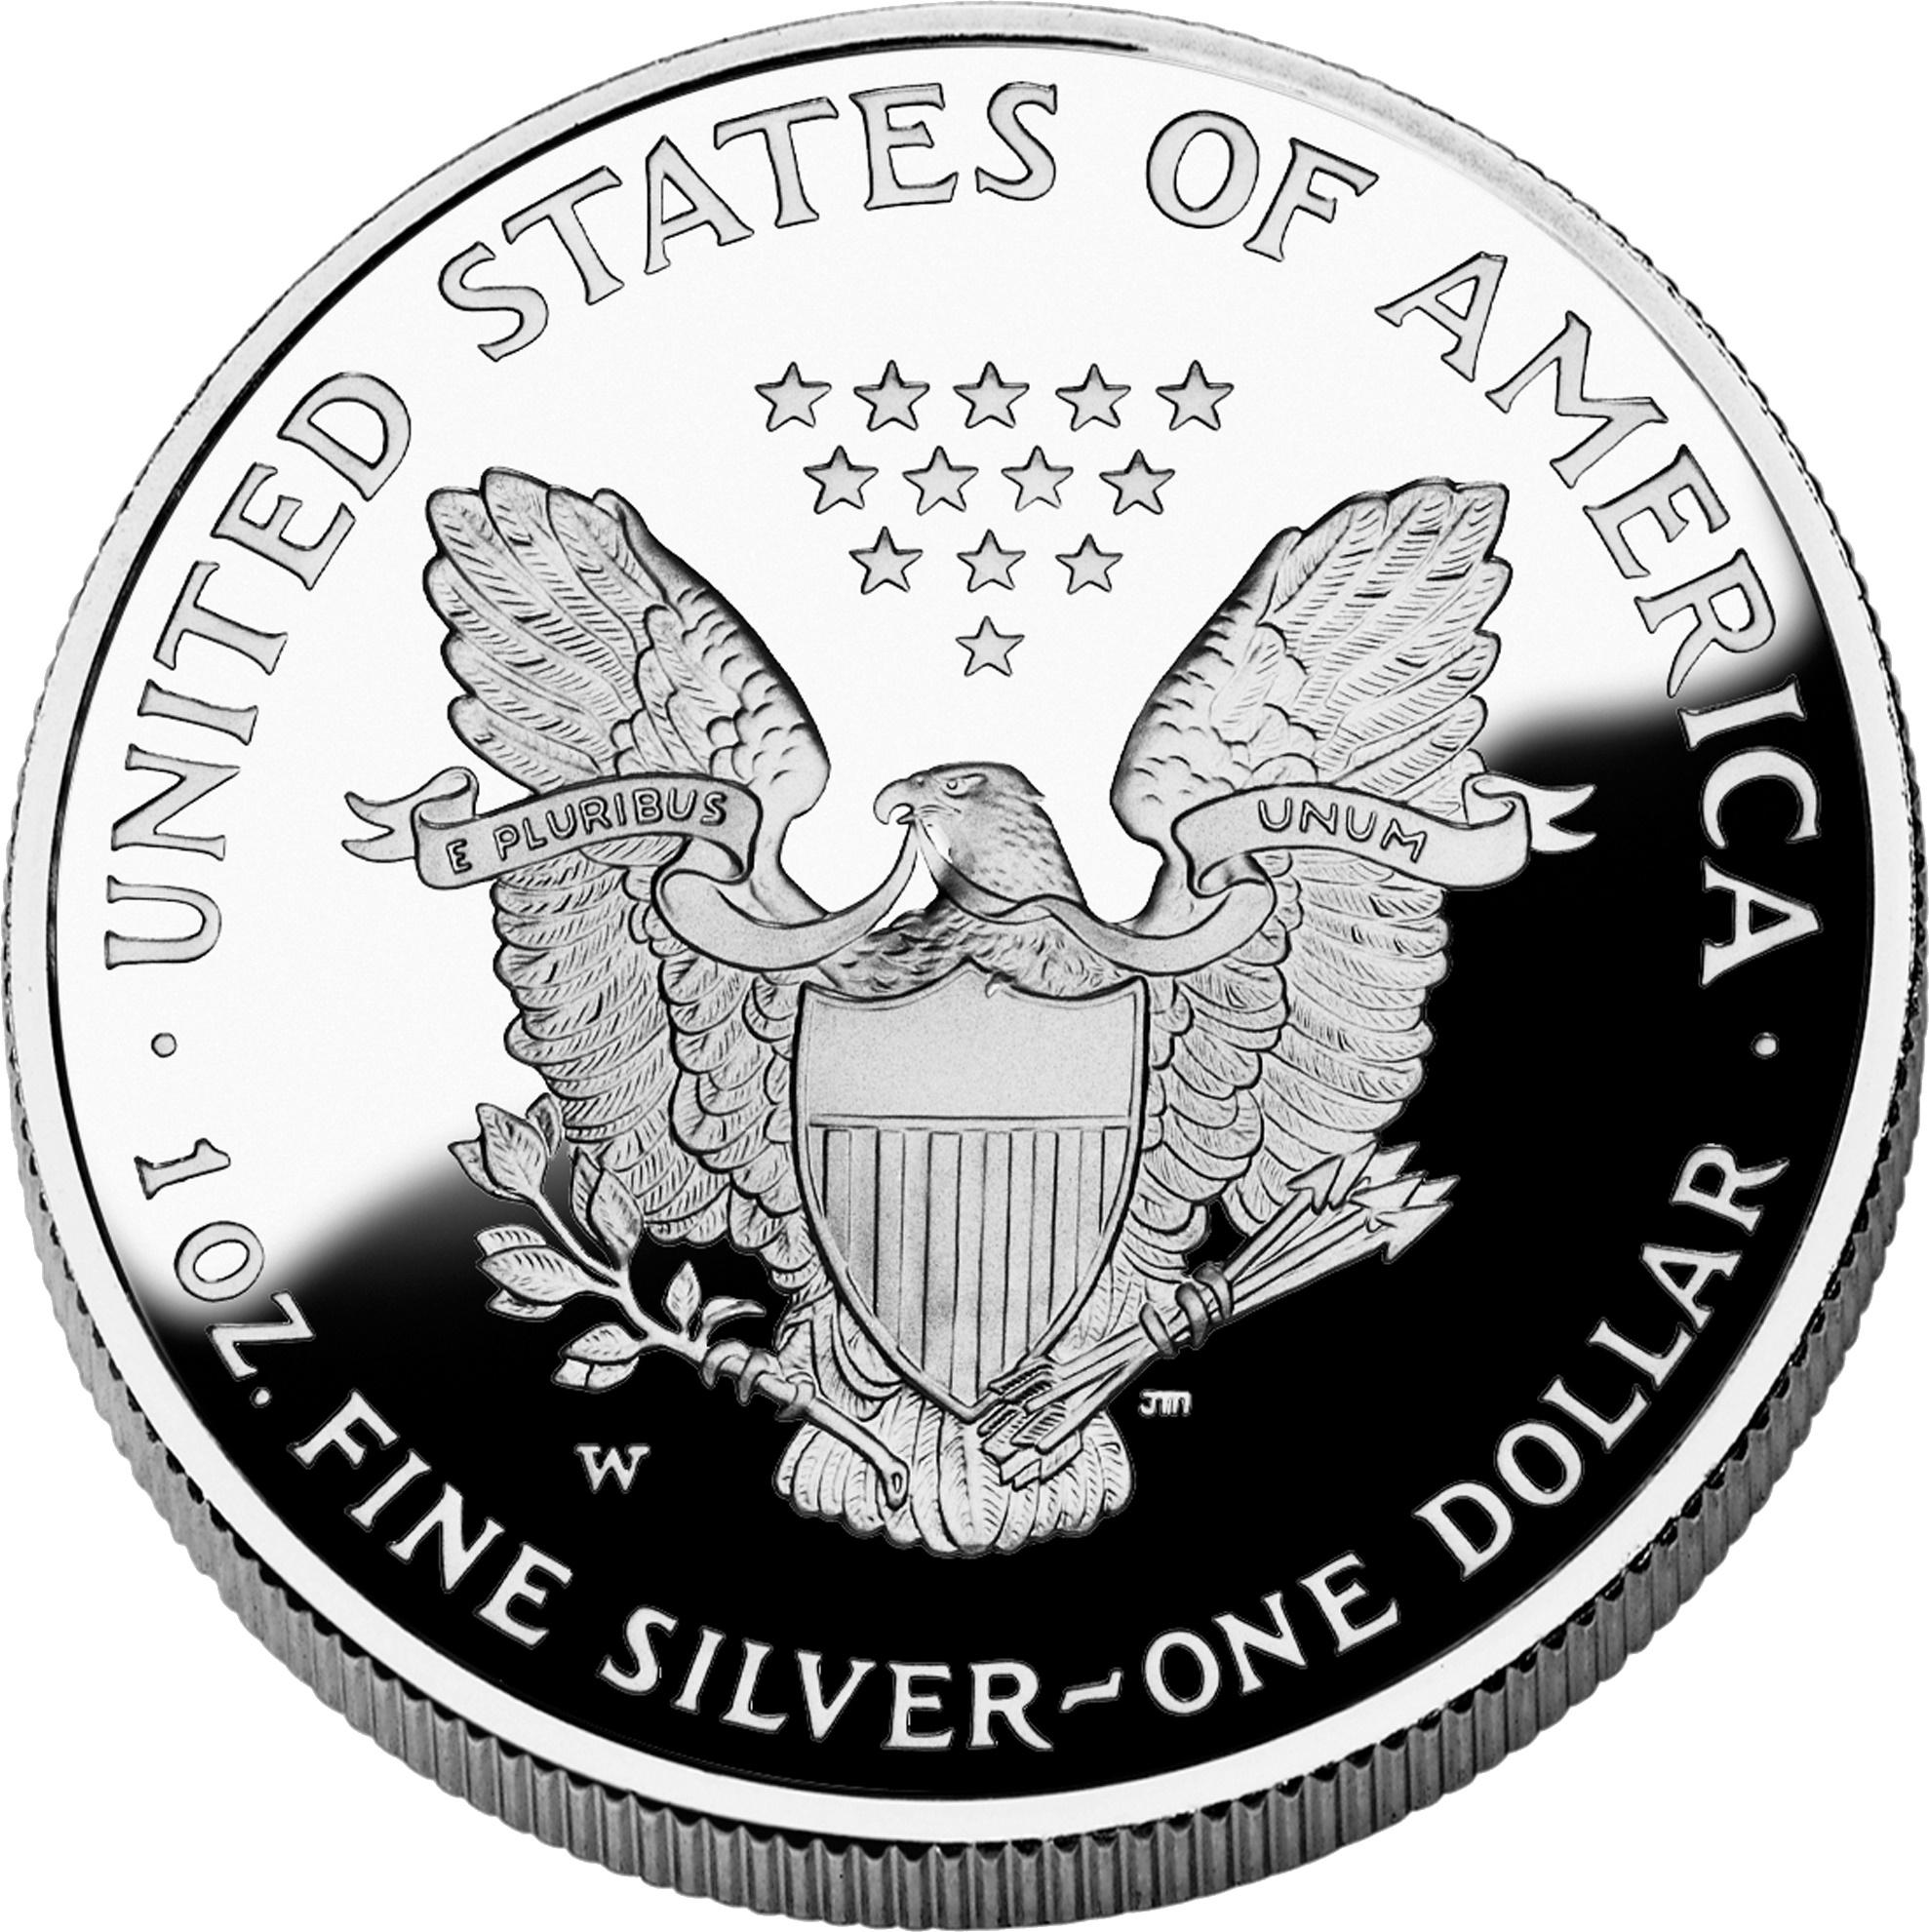 American Eagle Silver Dollar 1992 Value American Eagle